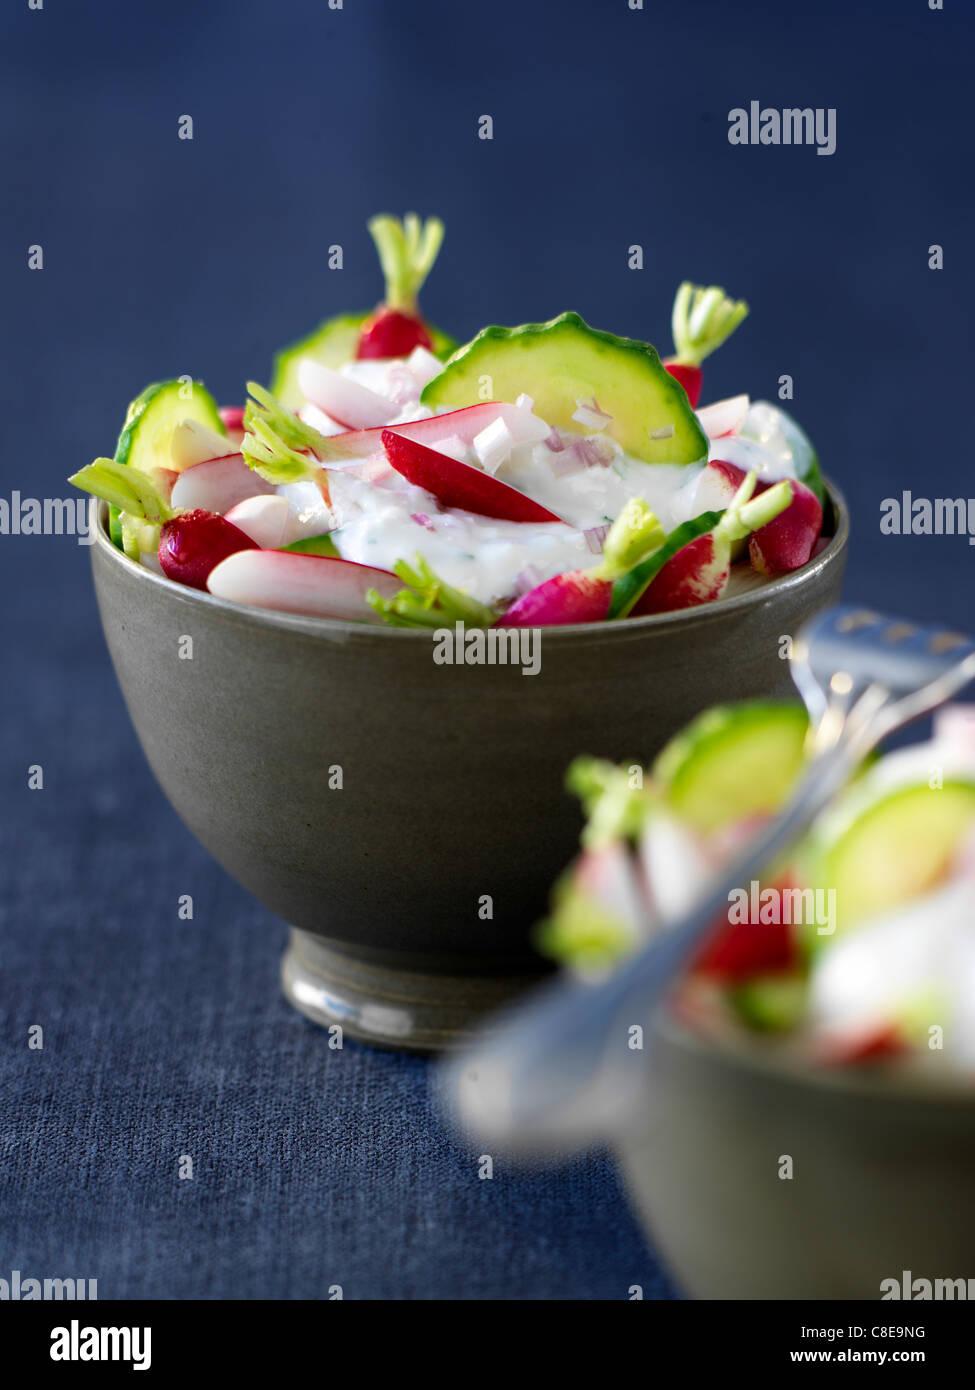 Crunchy salad - Stock Image